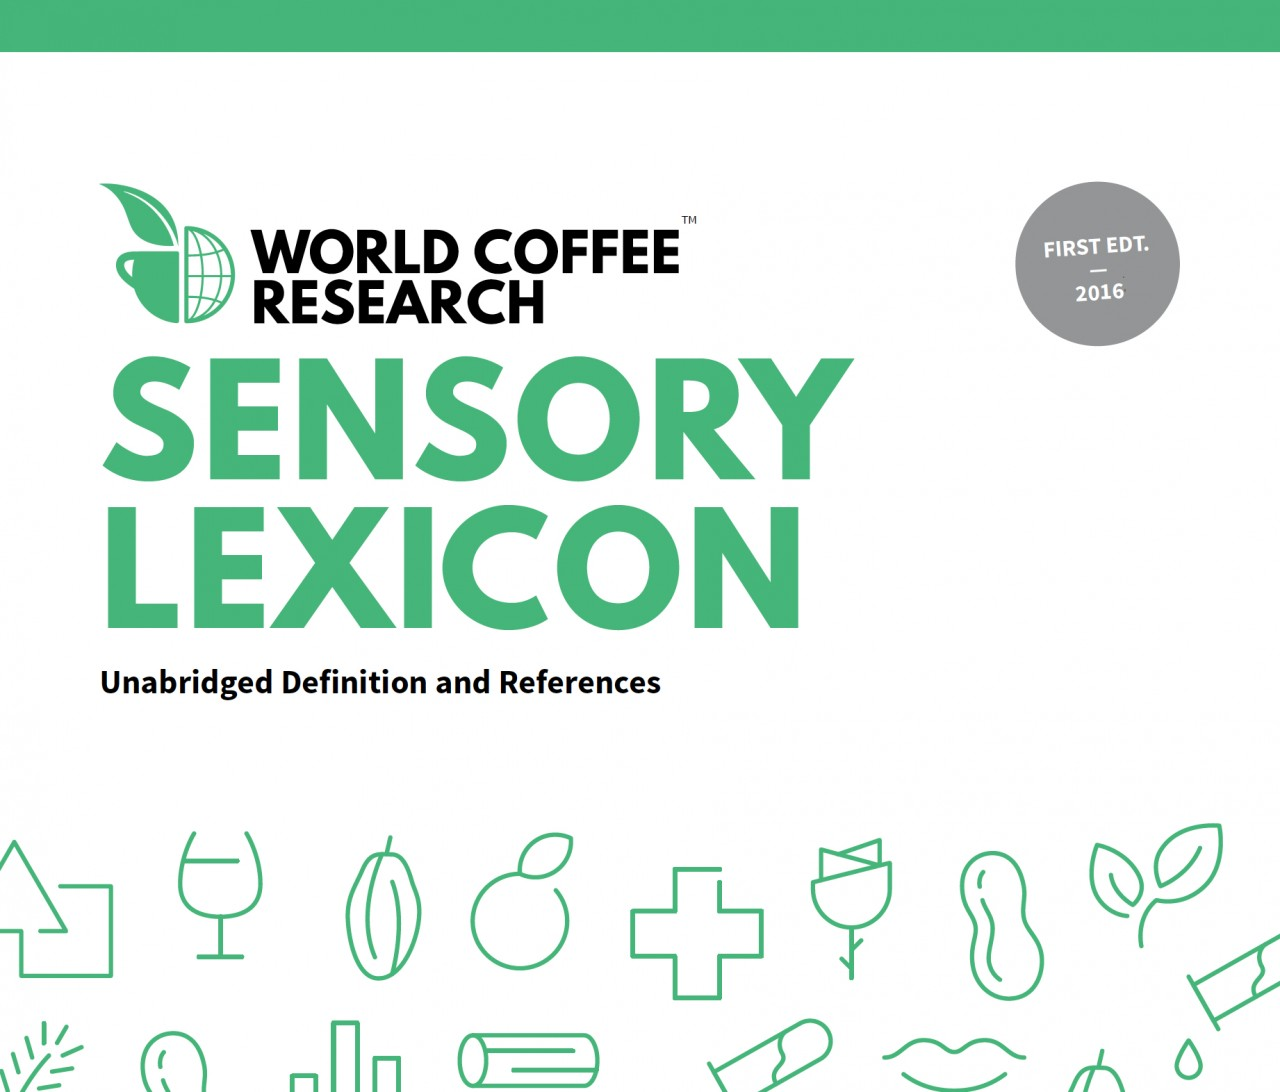 WORLD COFFEE RESEARCH™ SENSORY LEXICON(日本語版)がSCAJで承認されました